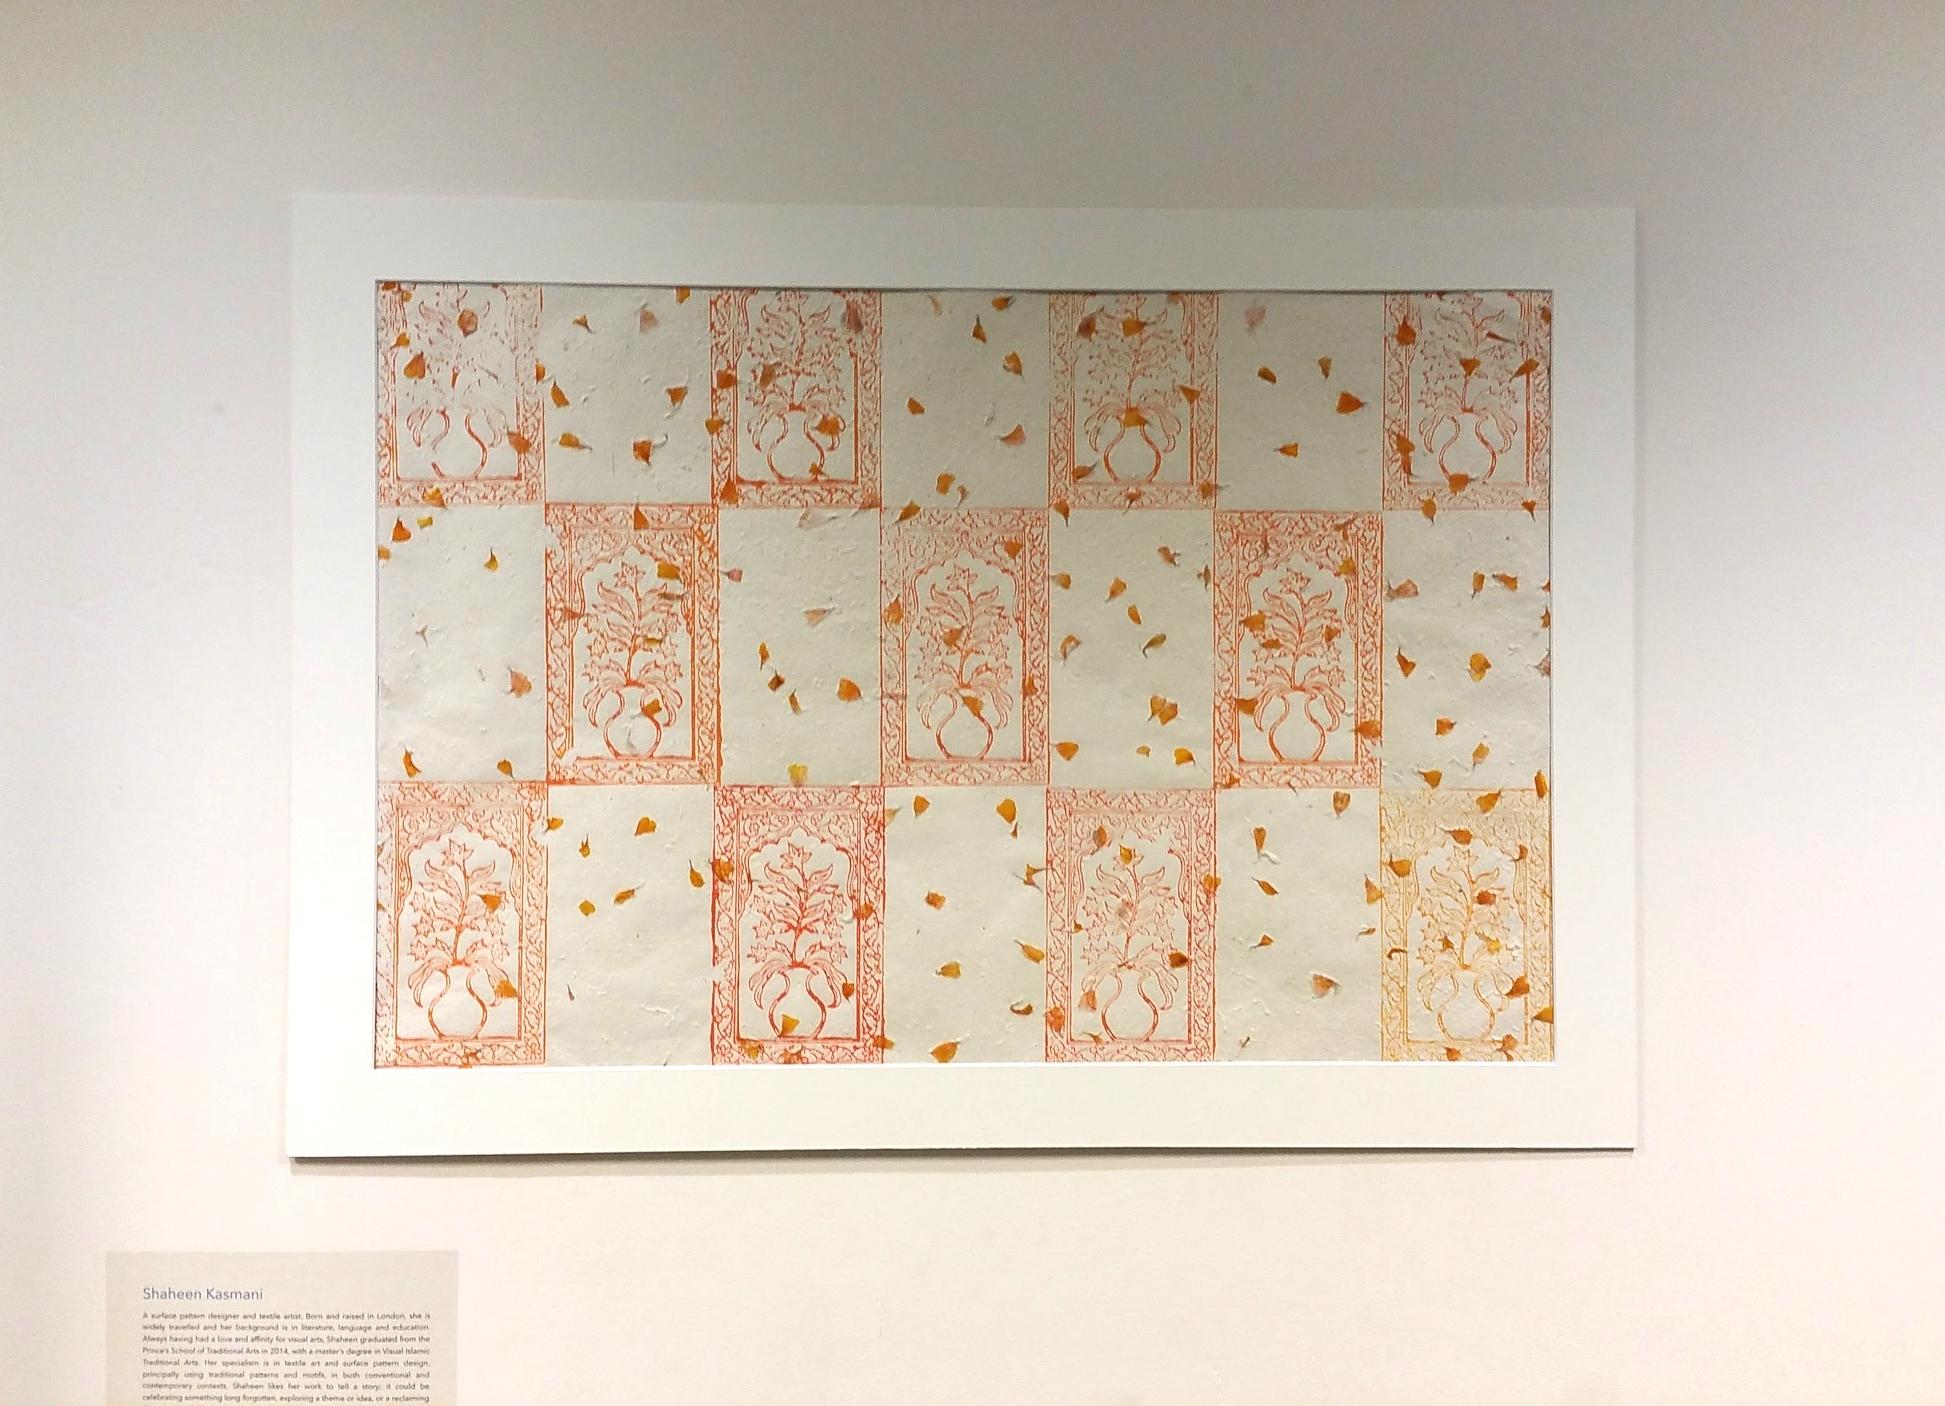 Mughal bricks ~ Indian Asian Islamic Textile Art, Pattern Design, Shaheen Kasmani